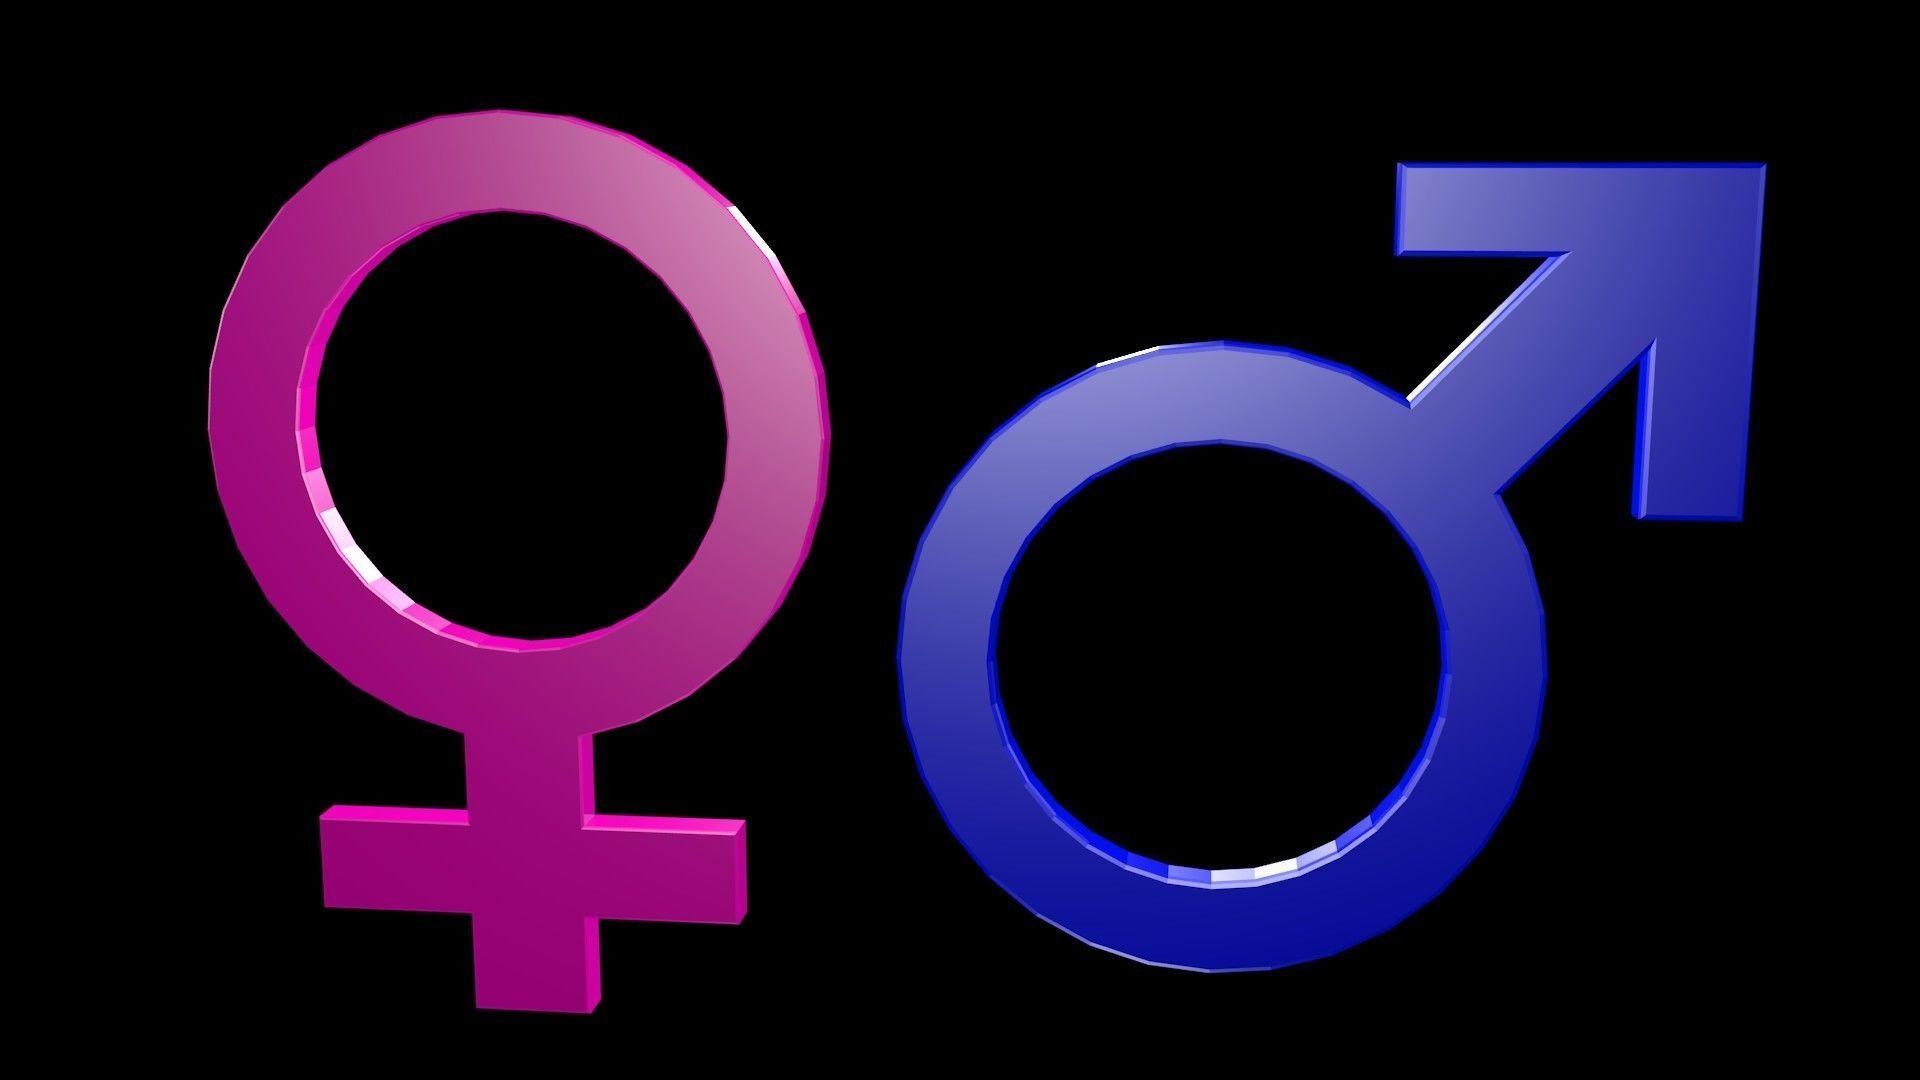 Low poly Symbols of gender 1